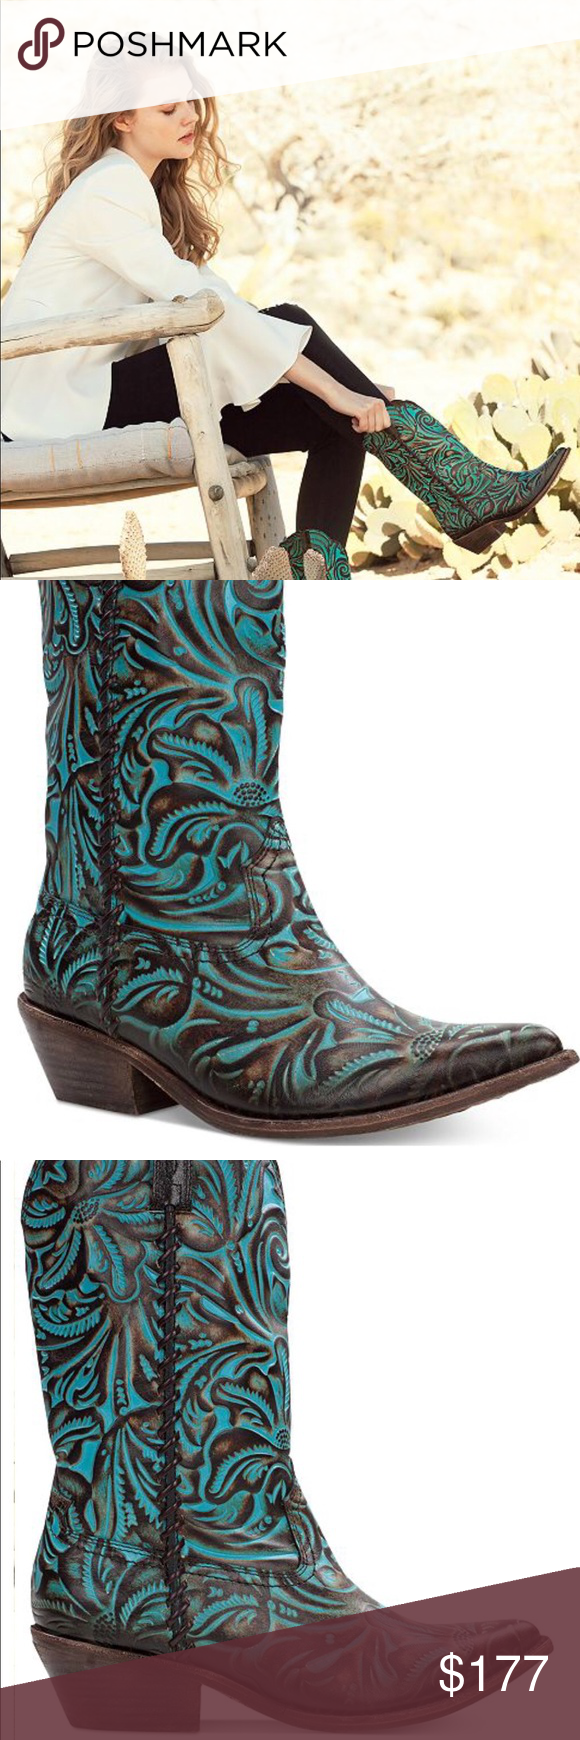 1f8cd408962 🔥HOT BUY🔥 Patricia Nash Cowboy Boots 🤠 Bergamo Turquoise Tooled ...